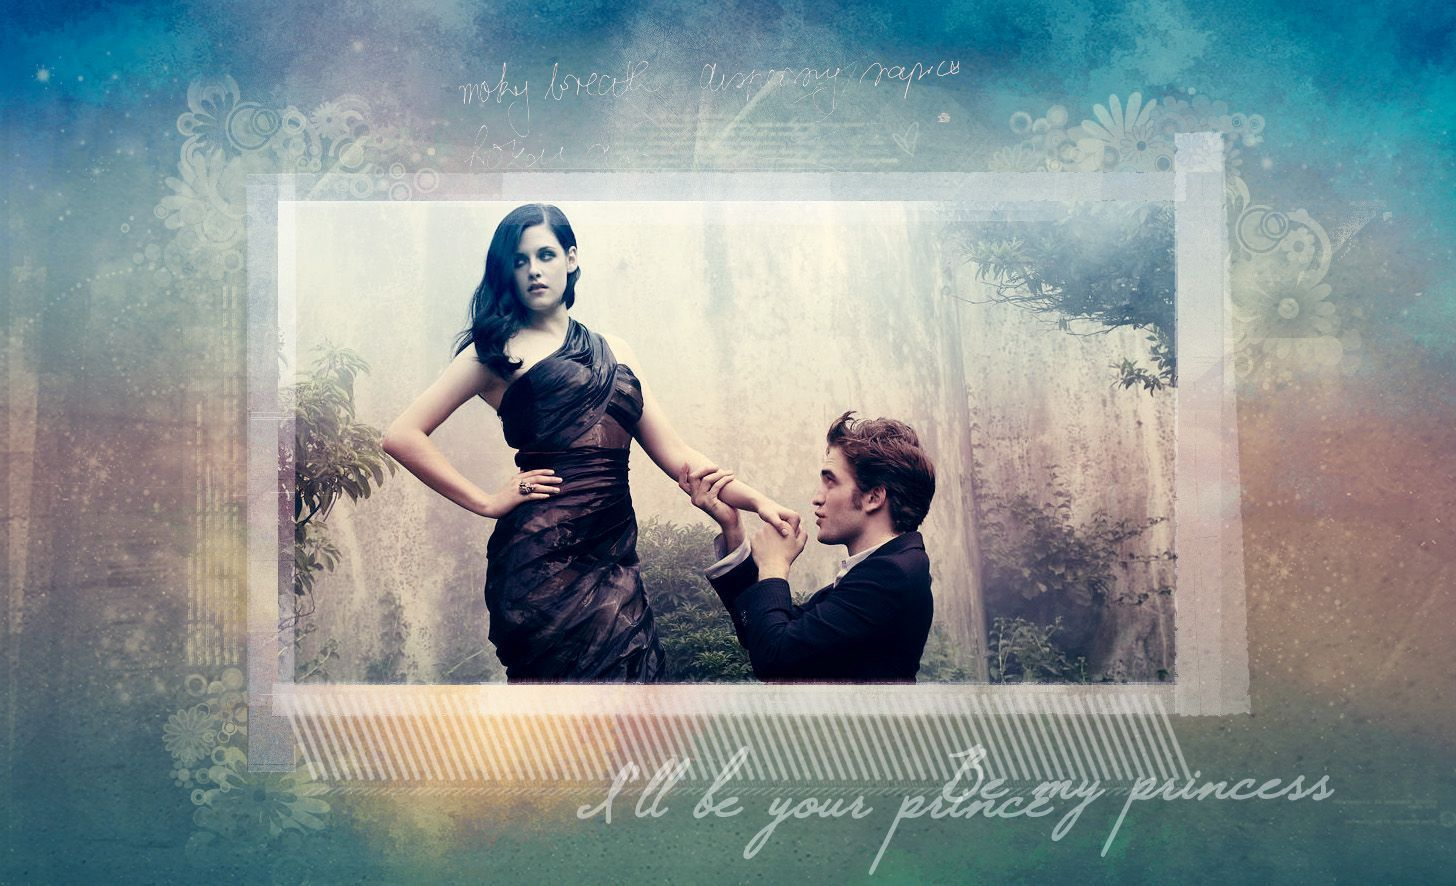 Robert and Kristen